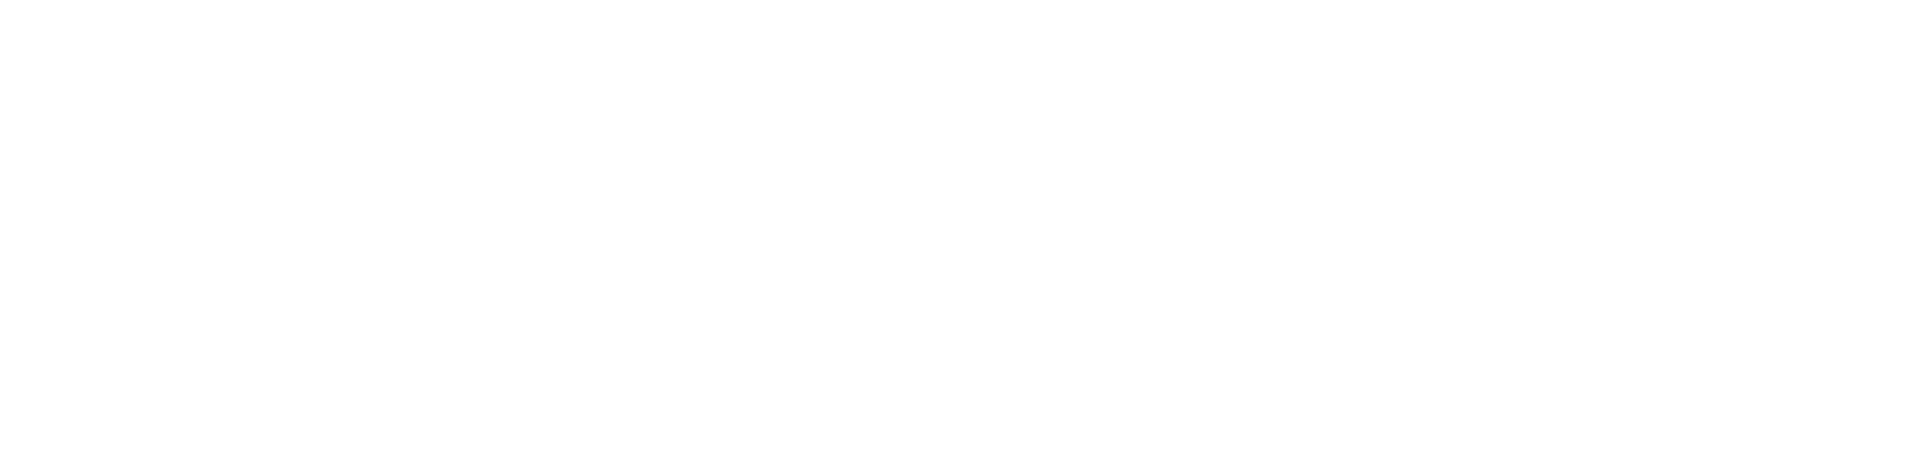 Pantzare information